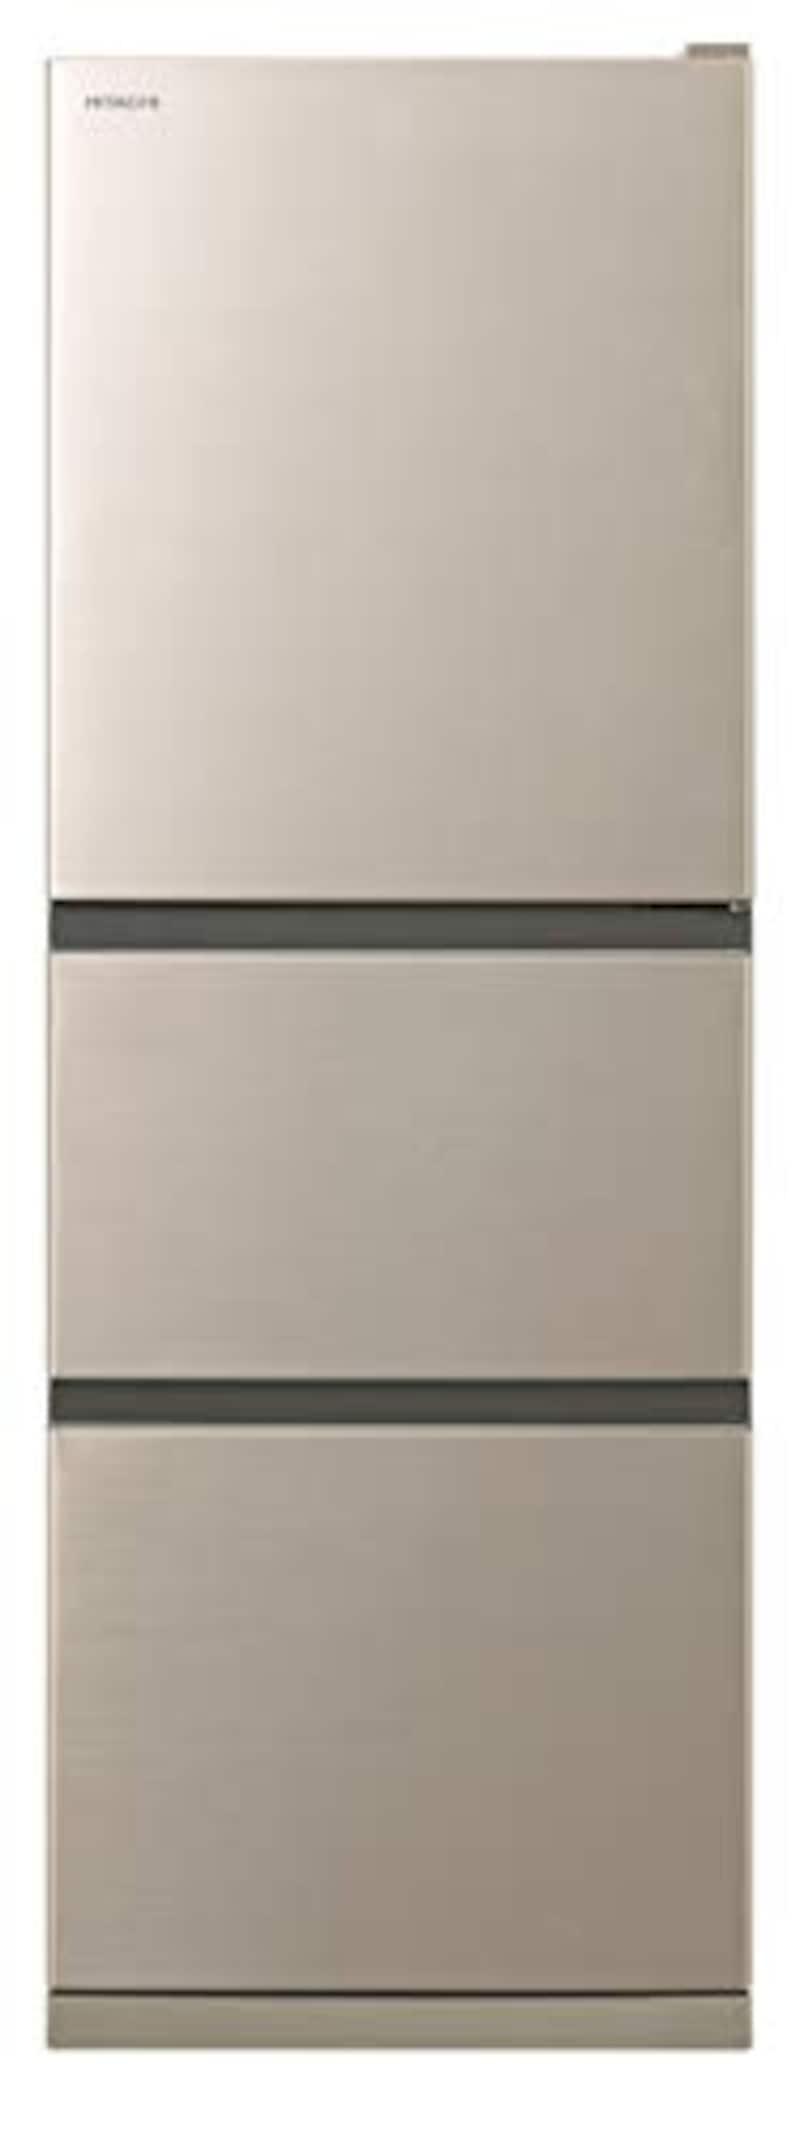 HITACHI(日立),3段冷蔵庫,R-27NV